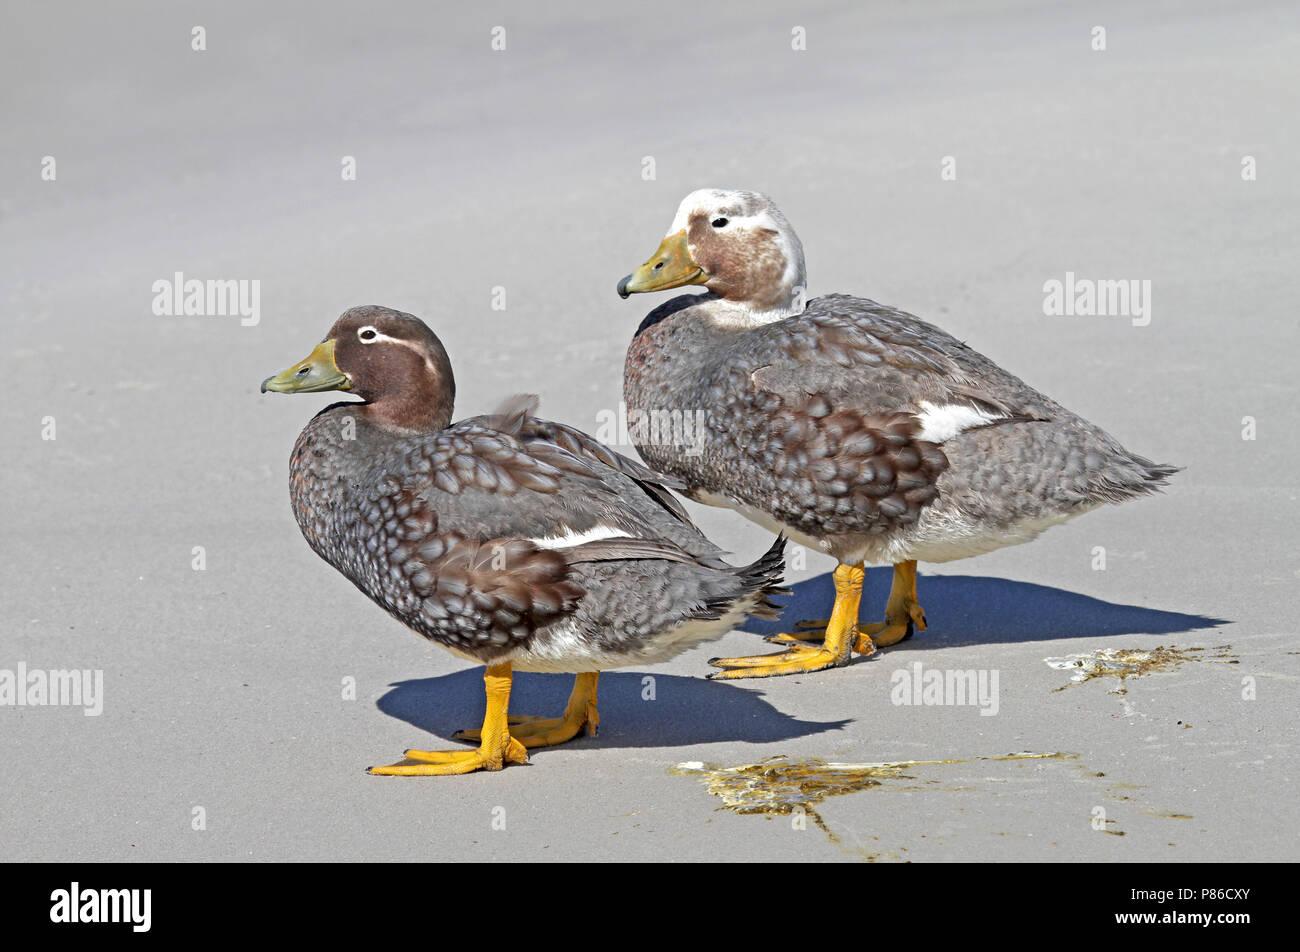 Falkland Steamer Duck (Tachyeres brachypterus) a flightless endemic of the Falkland Islands. - Stock Image